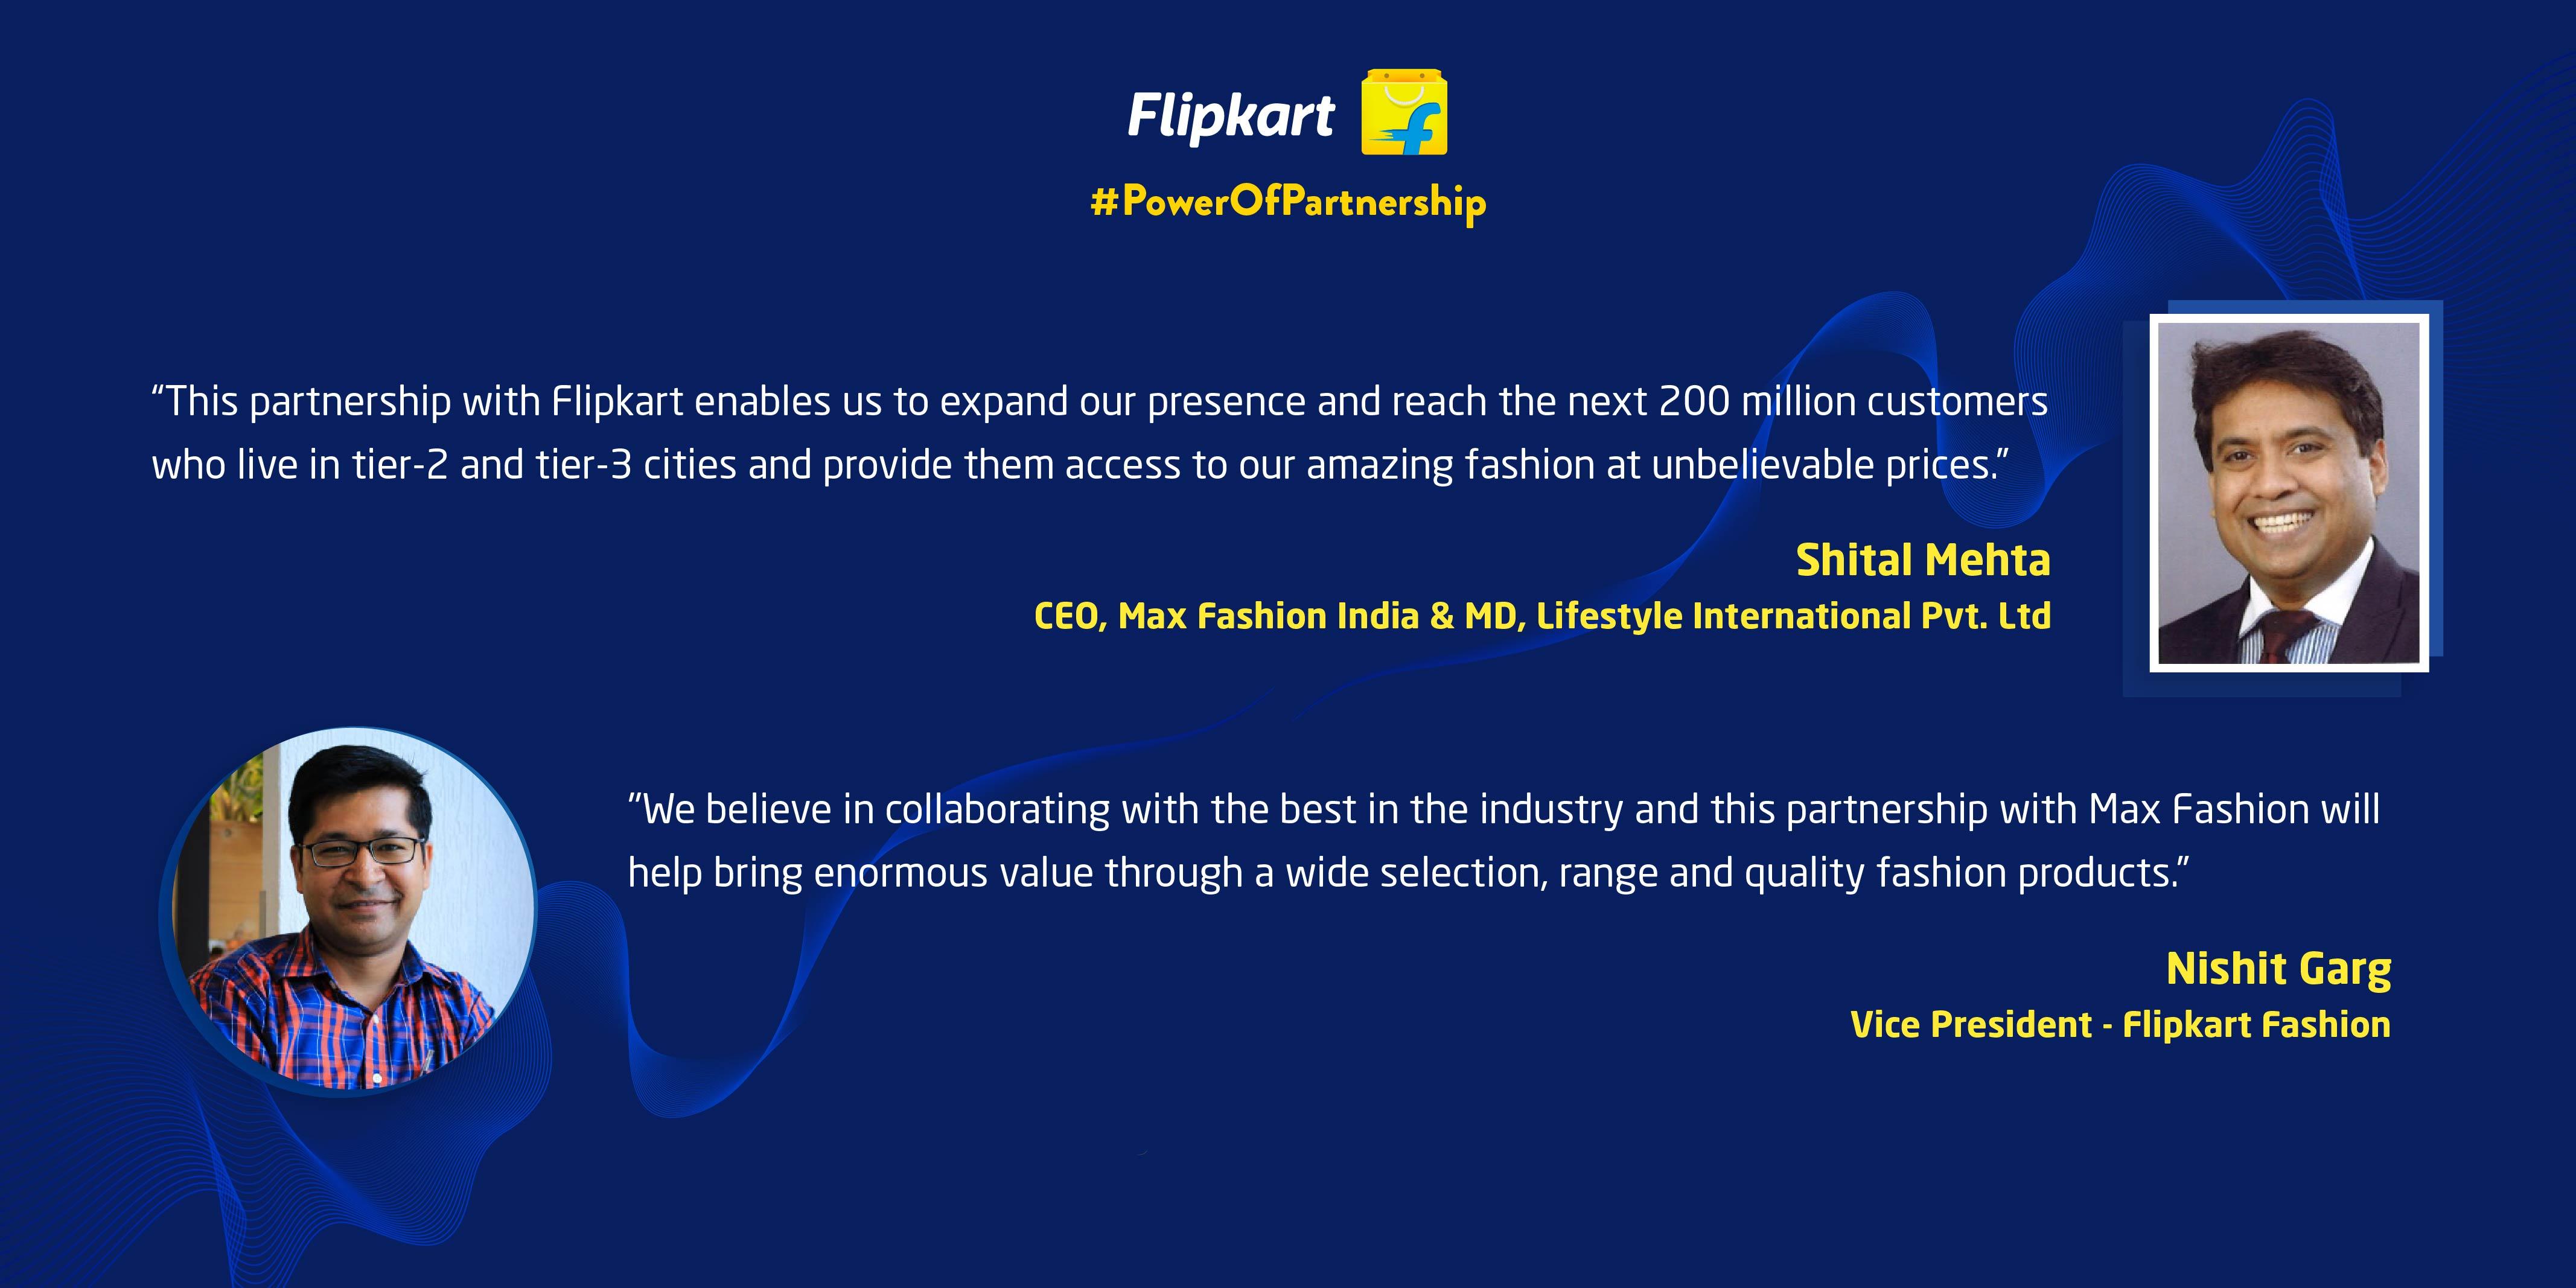 Power Of Partnership - Flipkart Max Brand Partnership for The Big Billion Days 2020